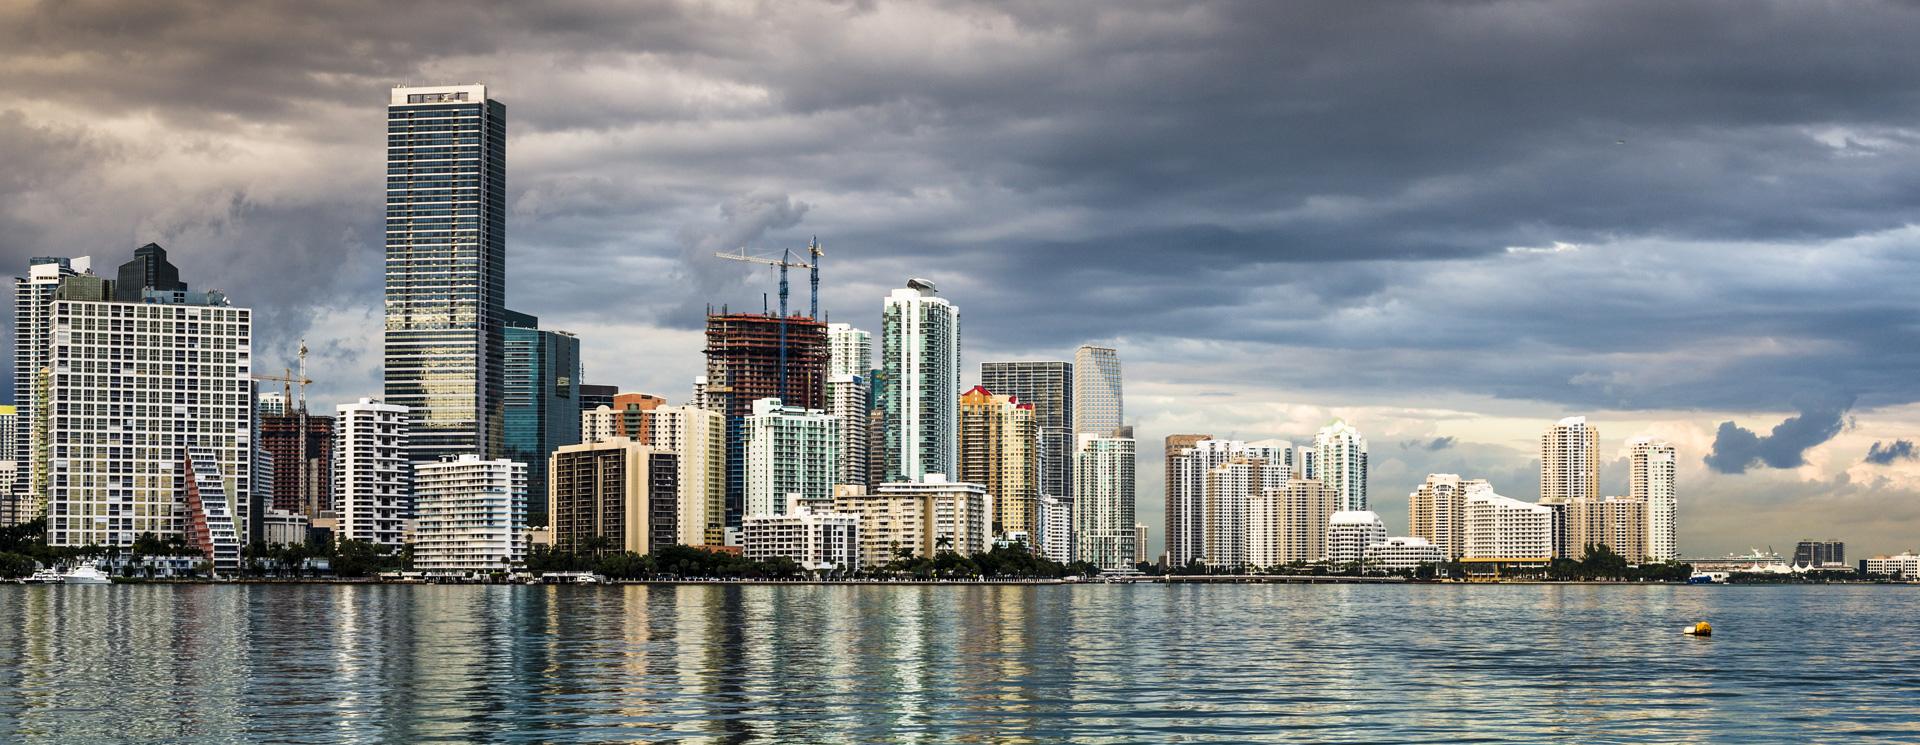 Miami_slide3